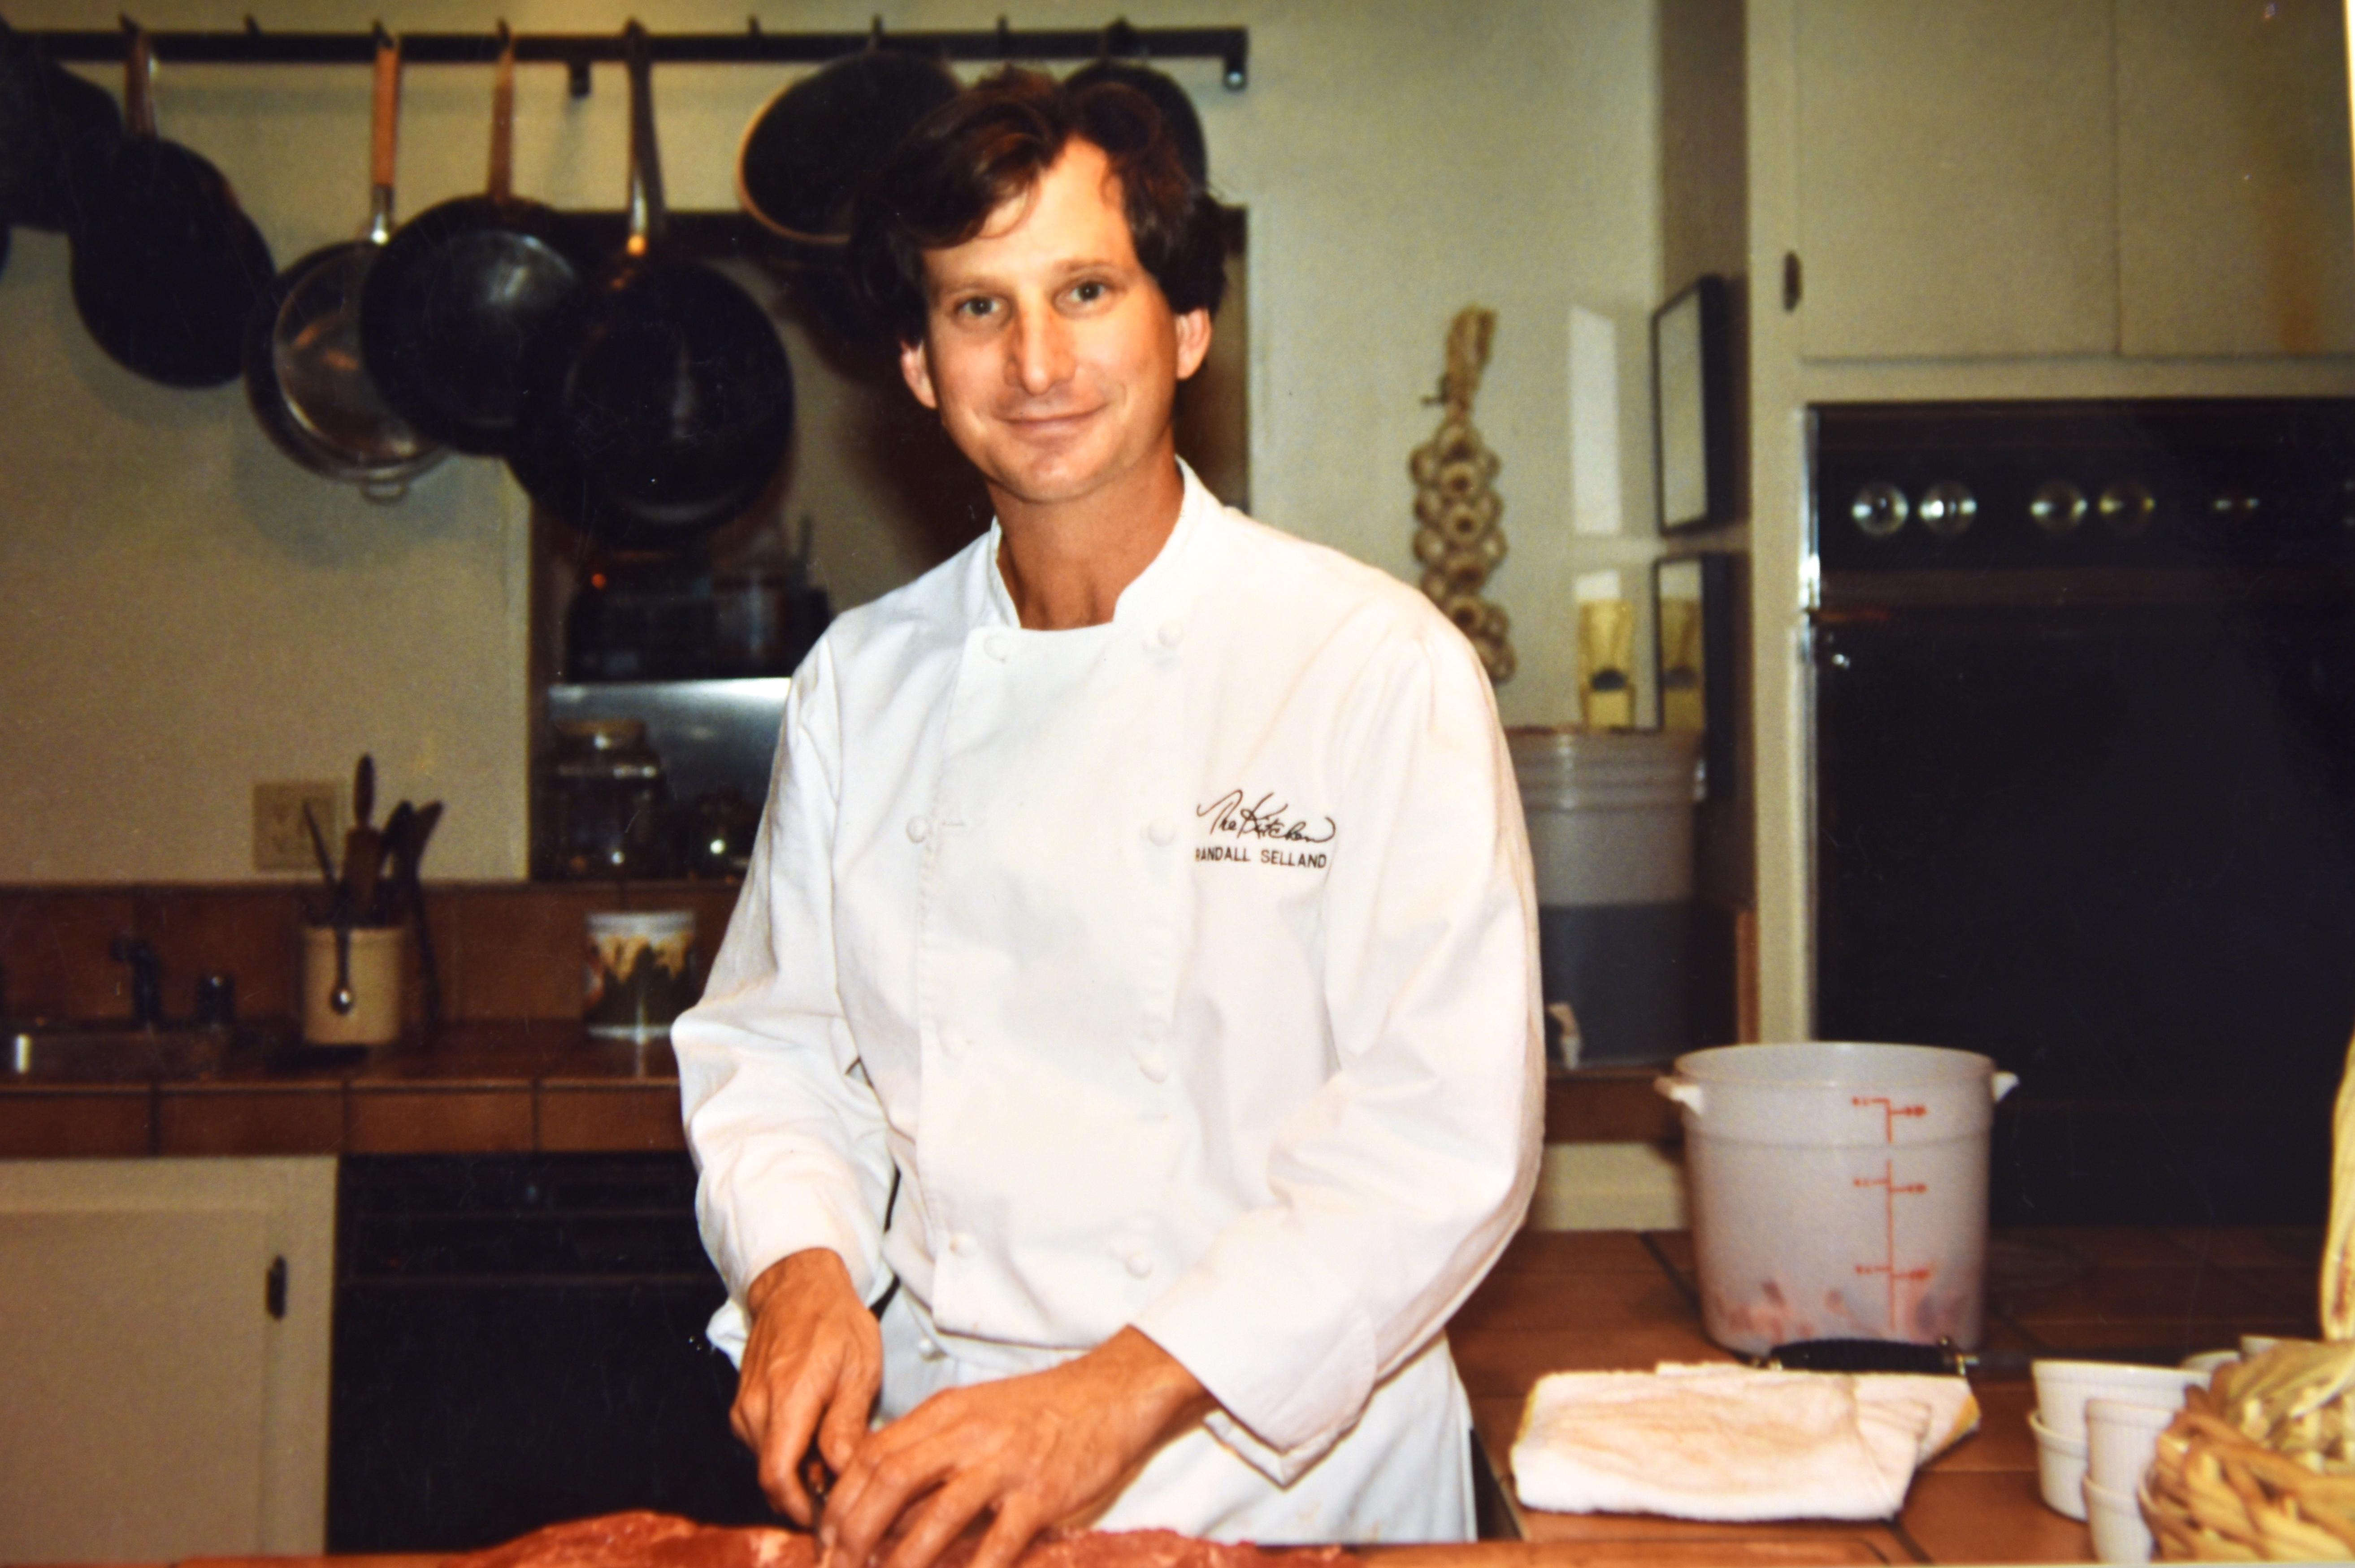 Chef Randall Selland at the original Kitchen location